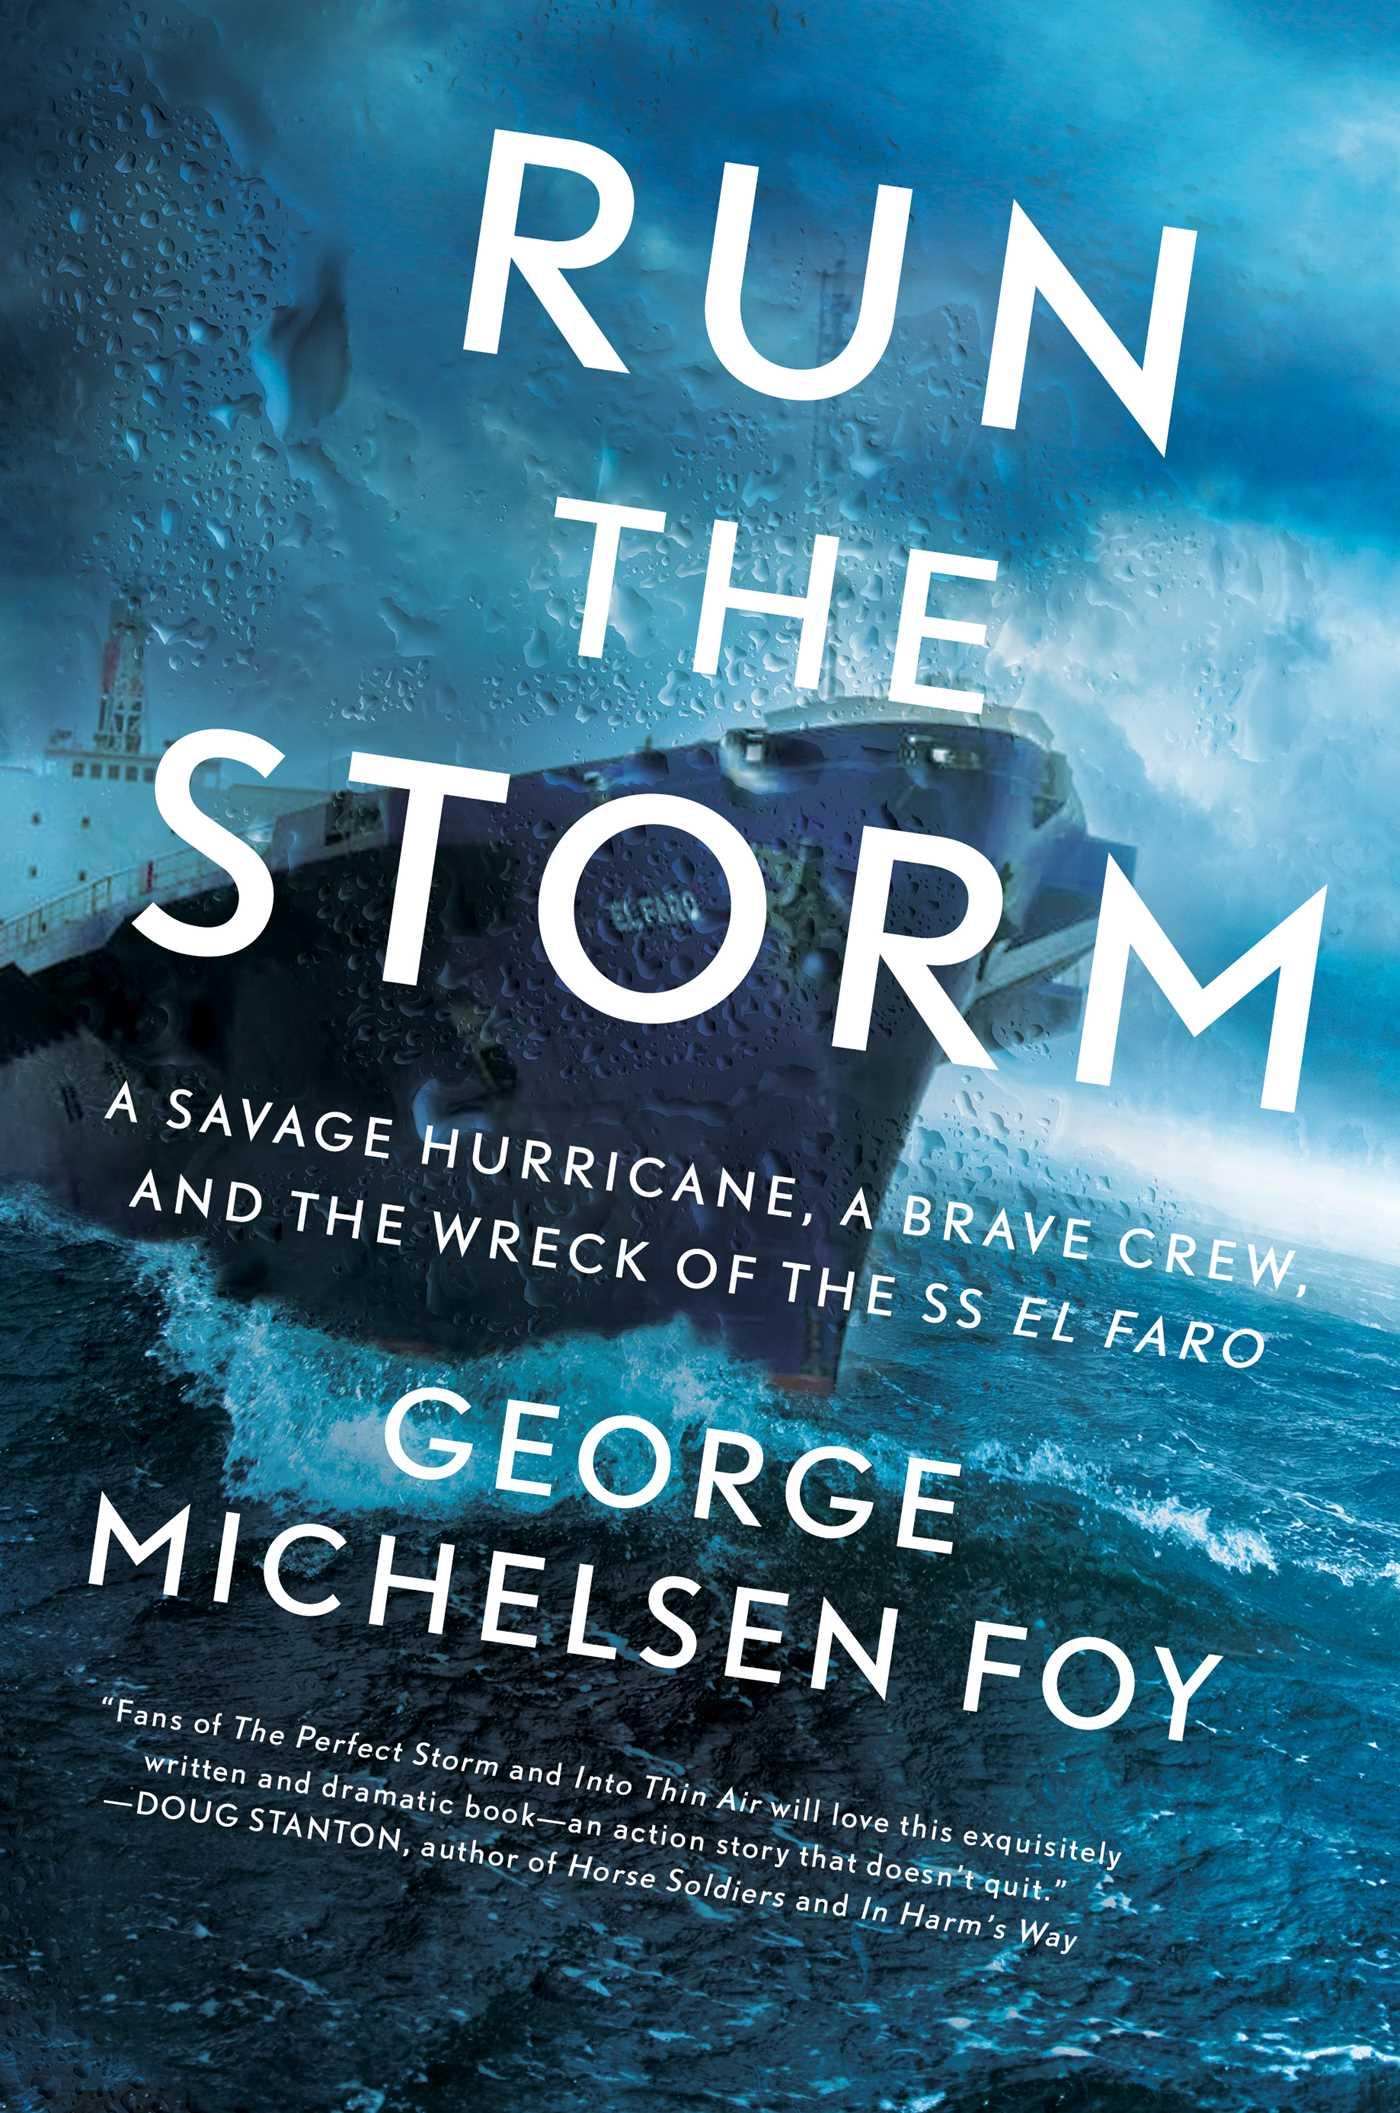 Run the storm 9781501184895 hr